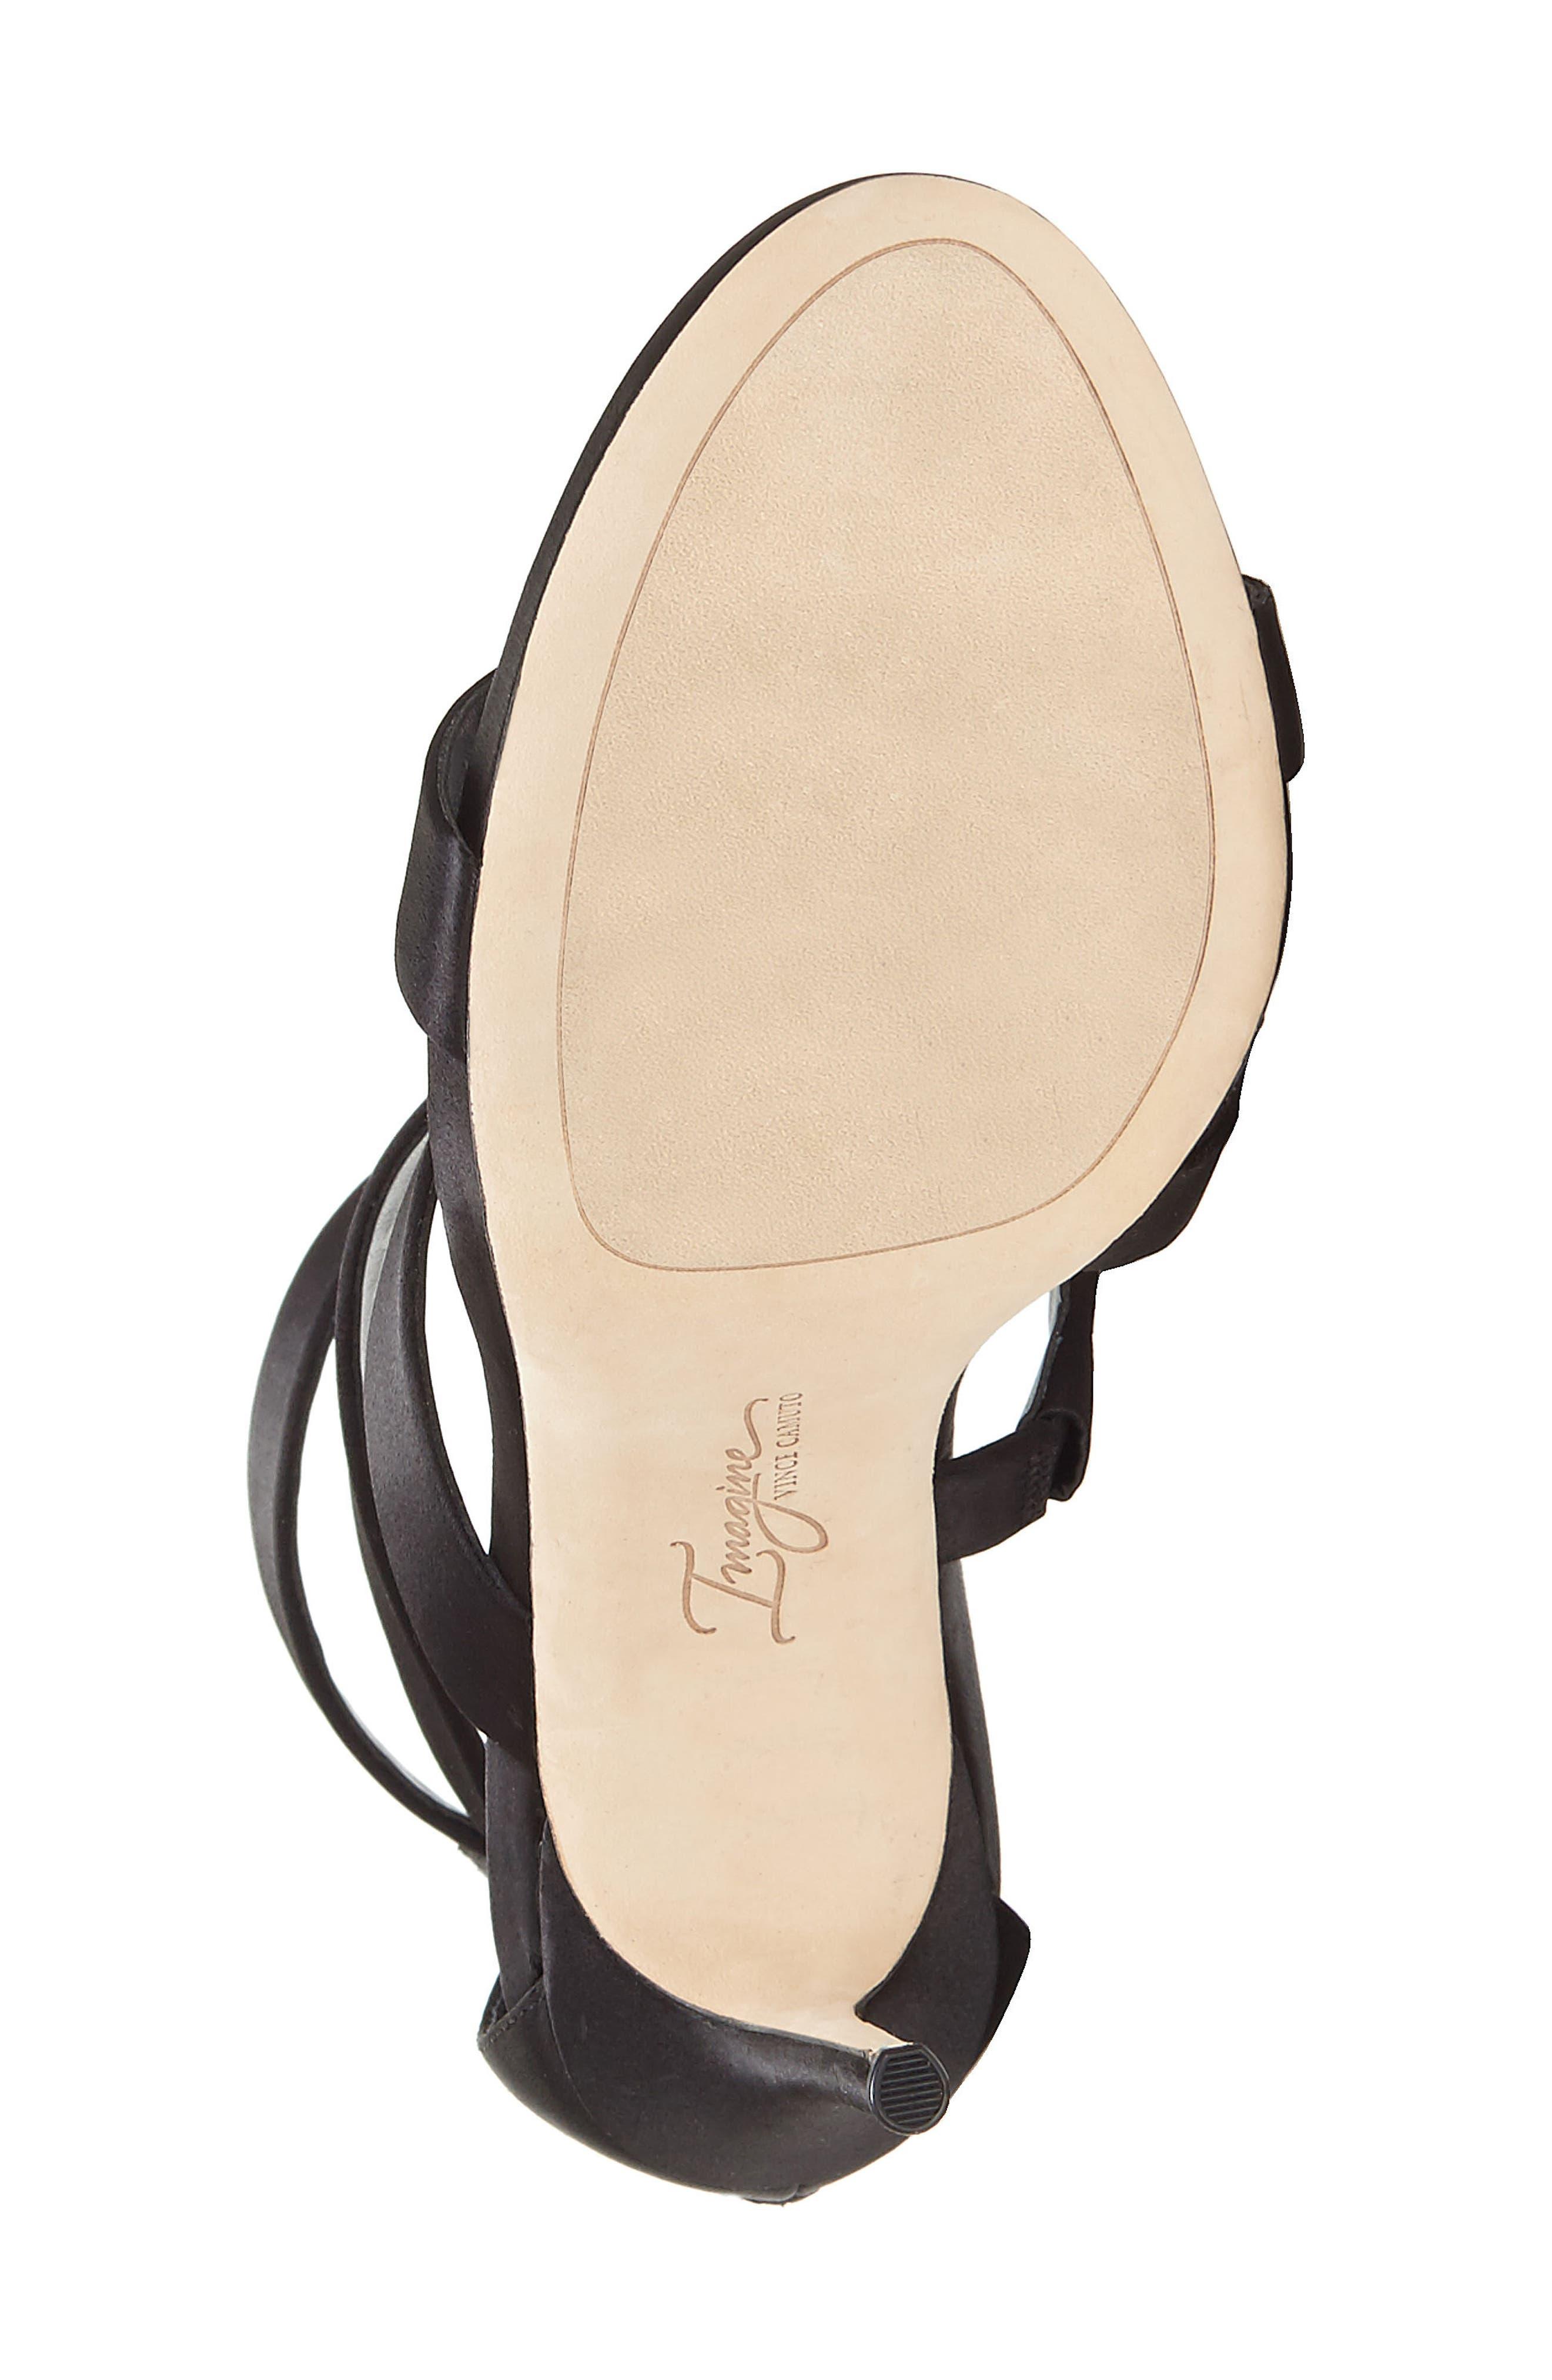 Imagine Vince Camuto Dalles Tall Strappy Sandal,                             Alternate thumbnail 6, color,                             BLACK SATIN